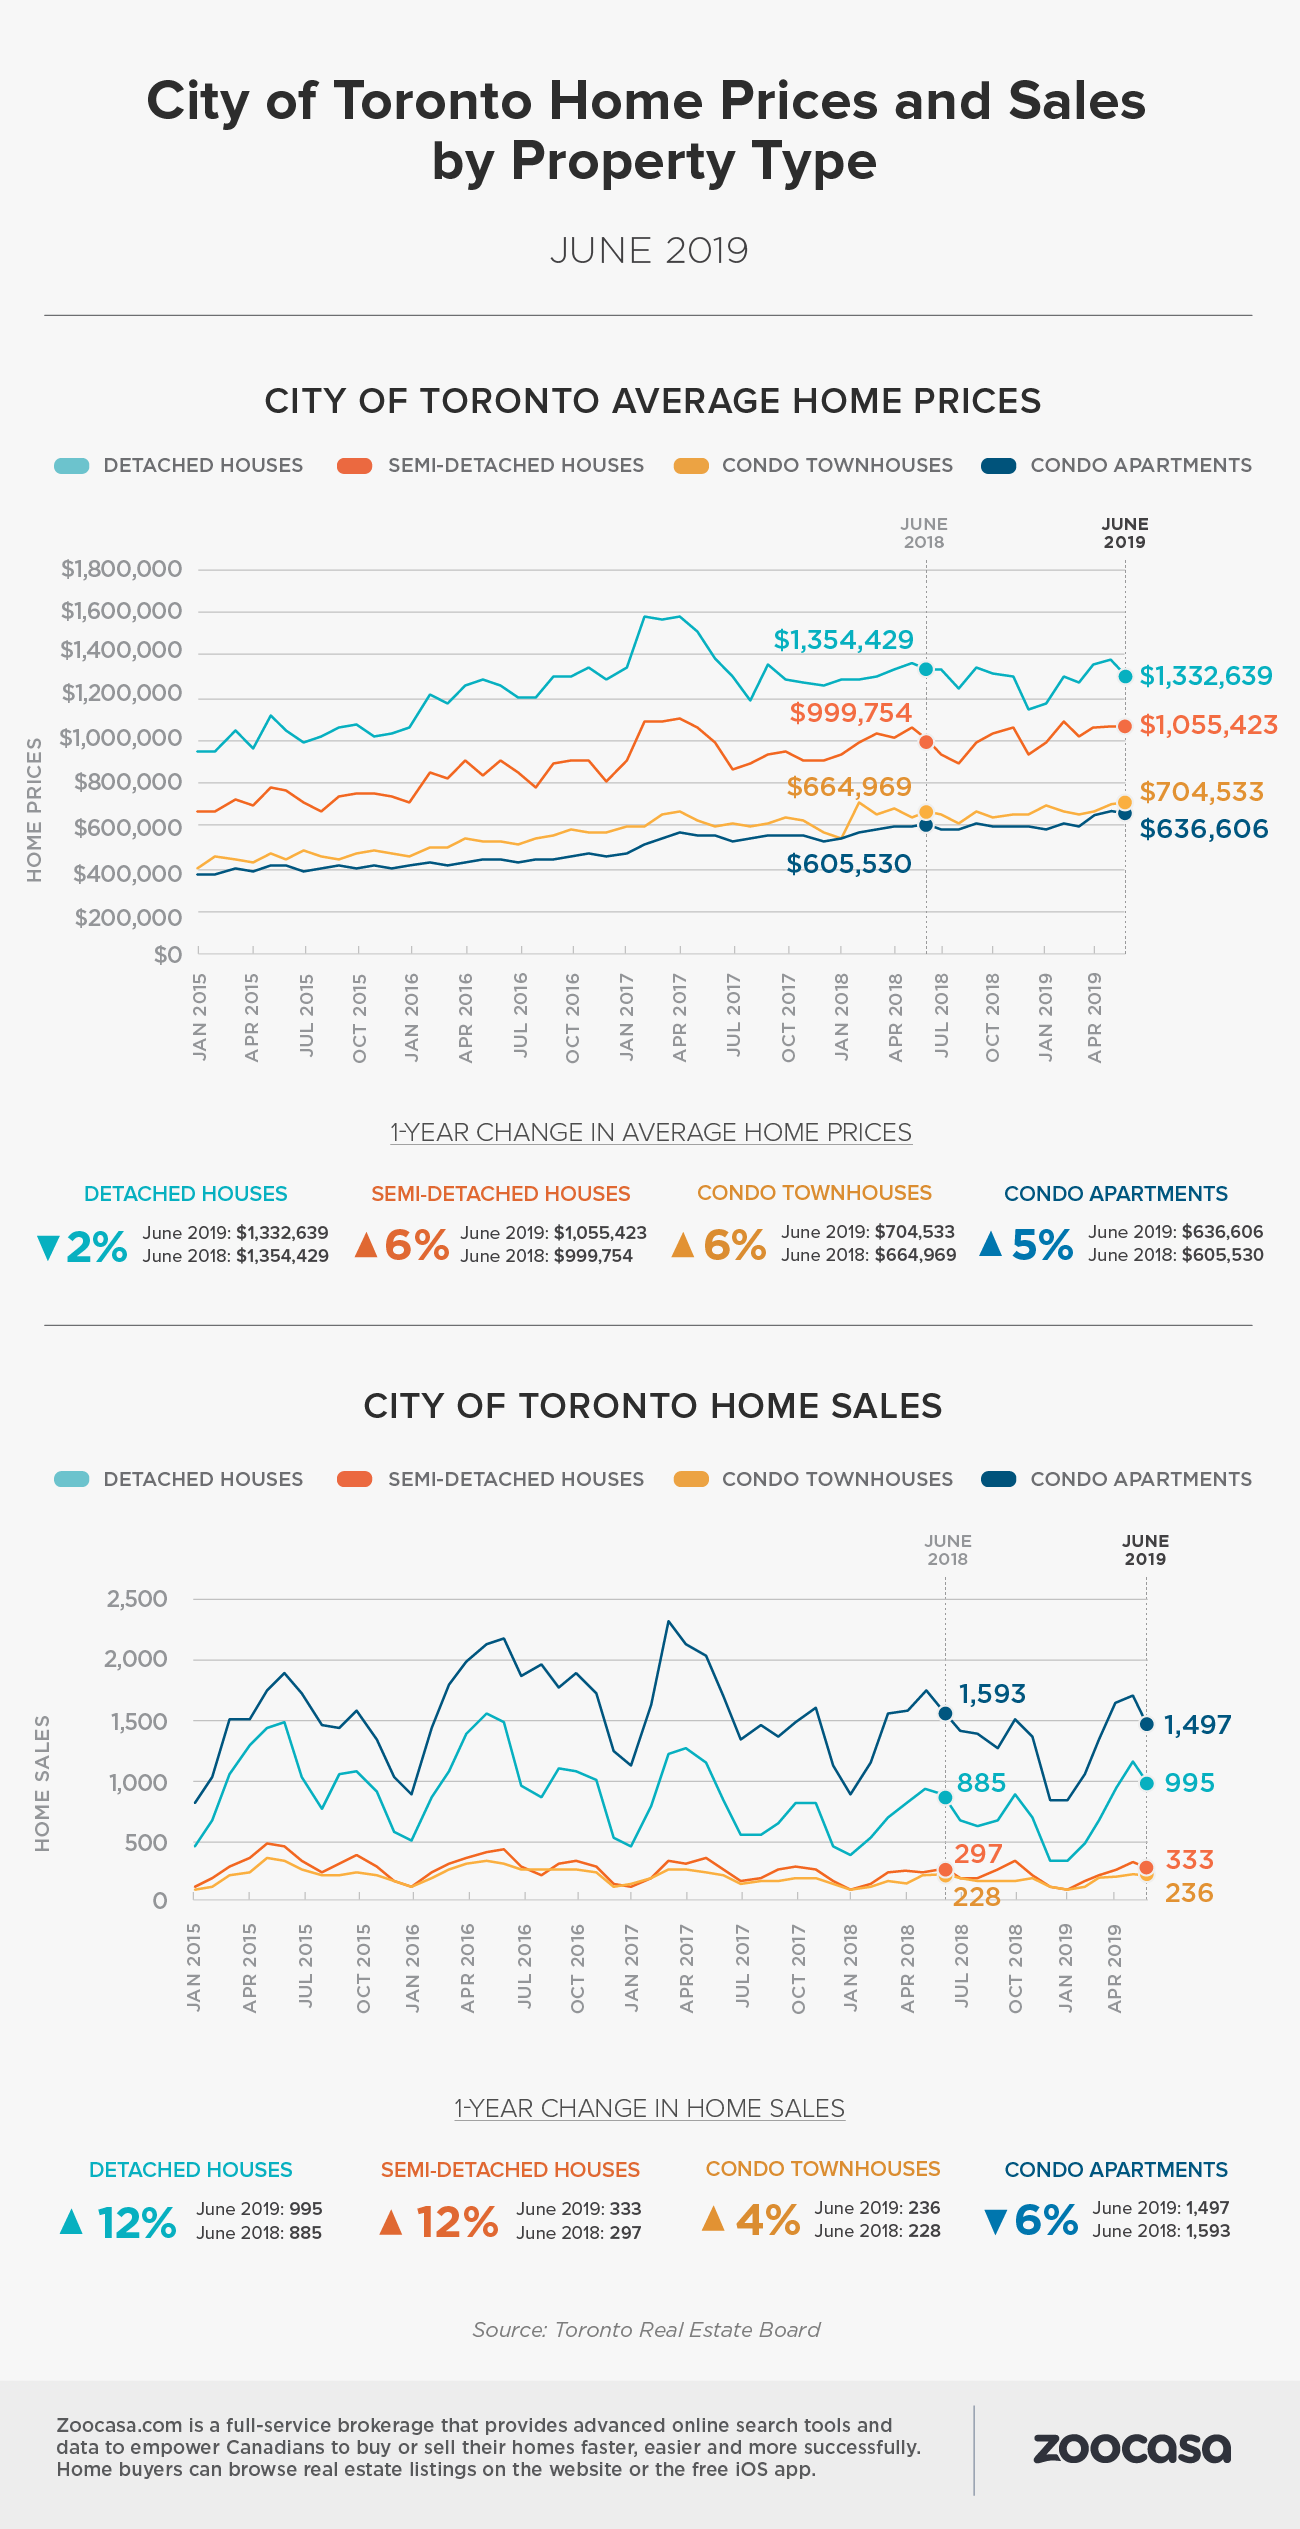 toronto-home-sales-prices-june-2019